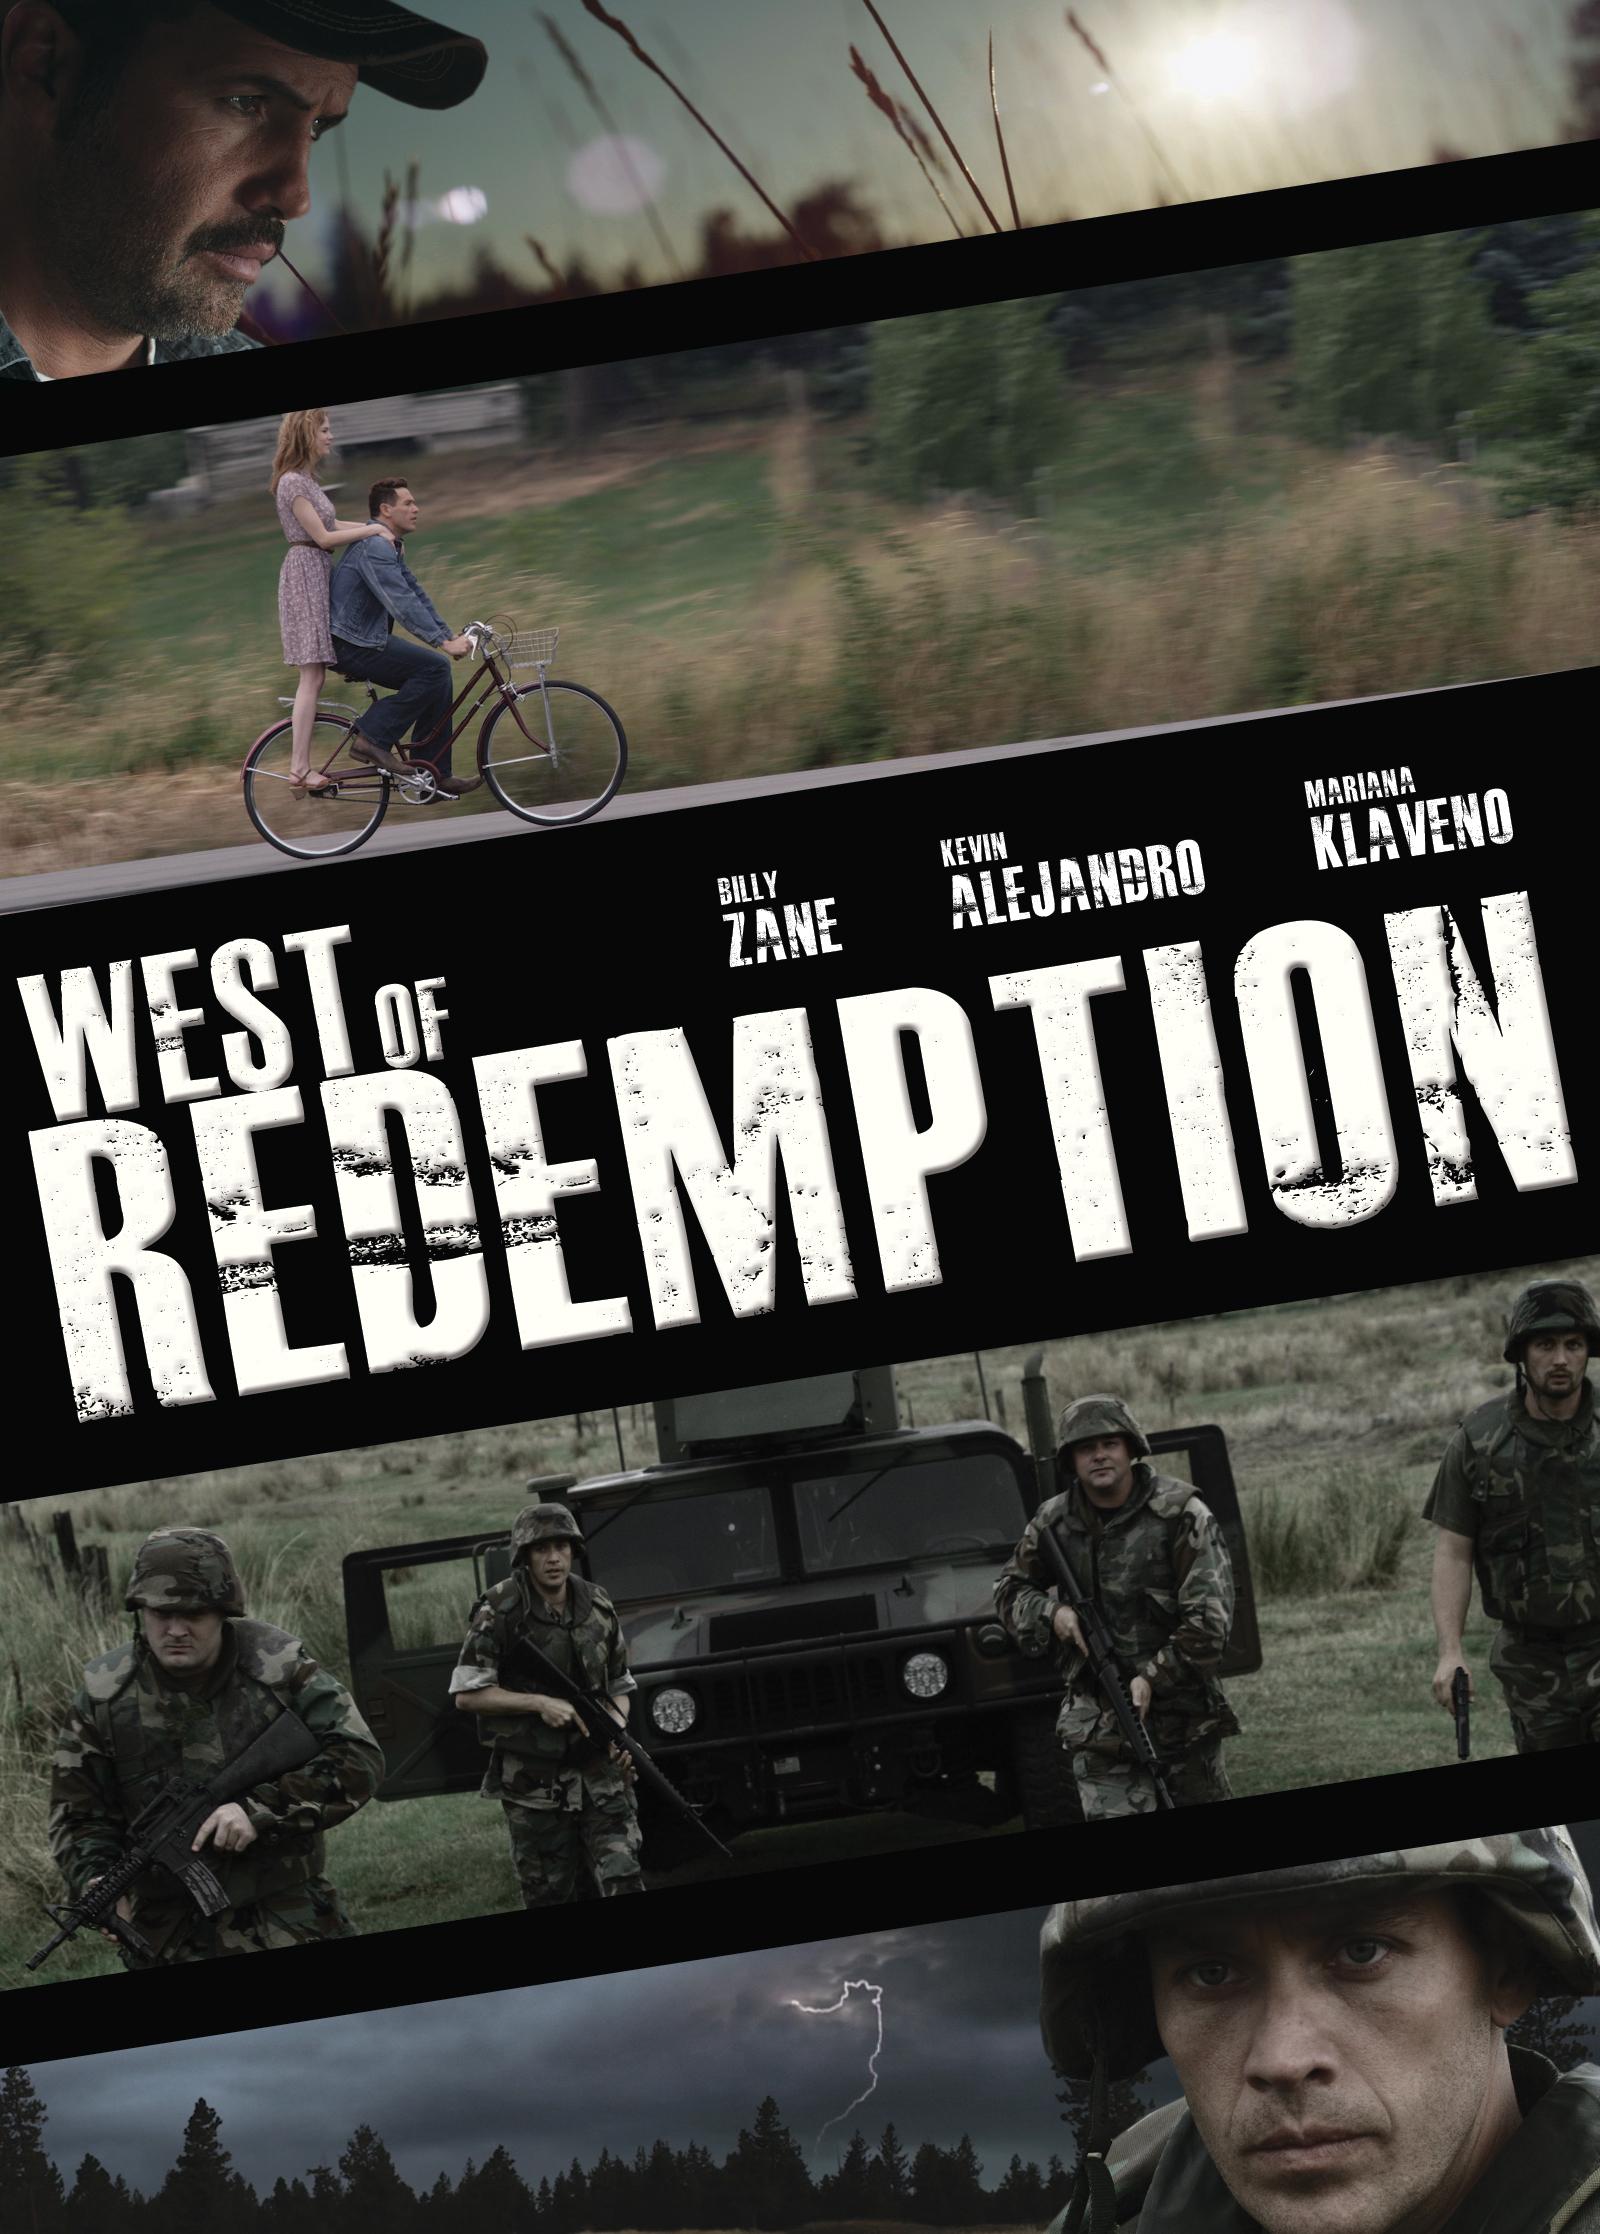 Billy Zane, Kevin Alejandro, and Mariana Klaveno in West of Redemption (2015)